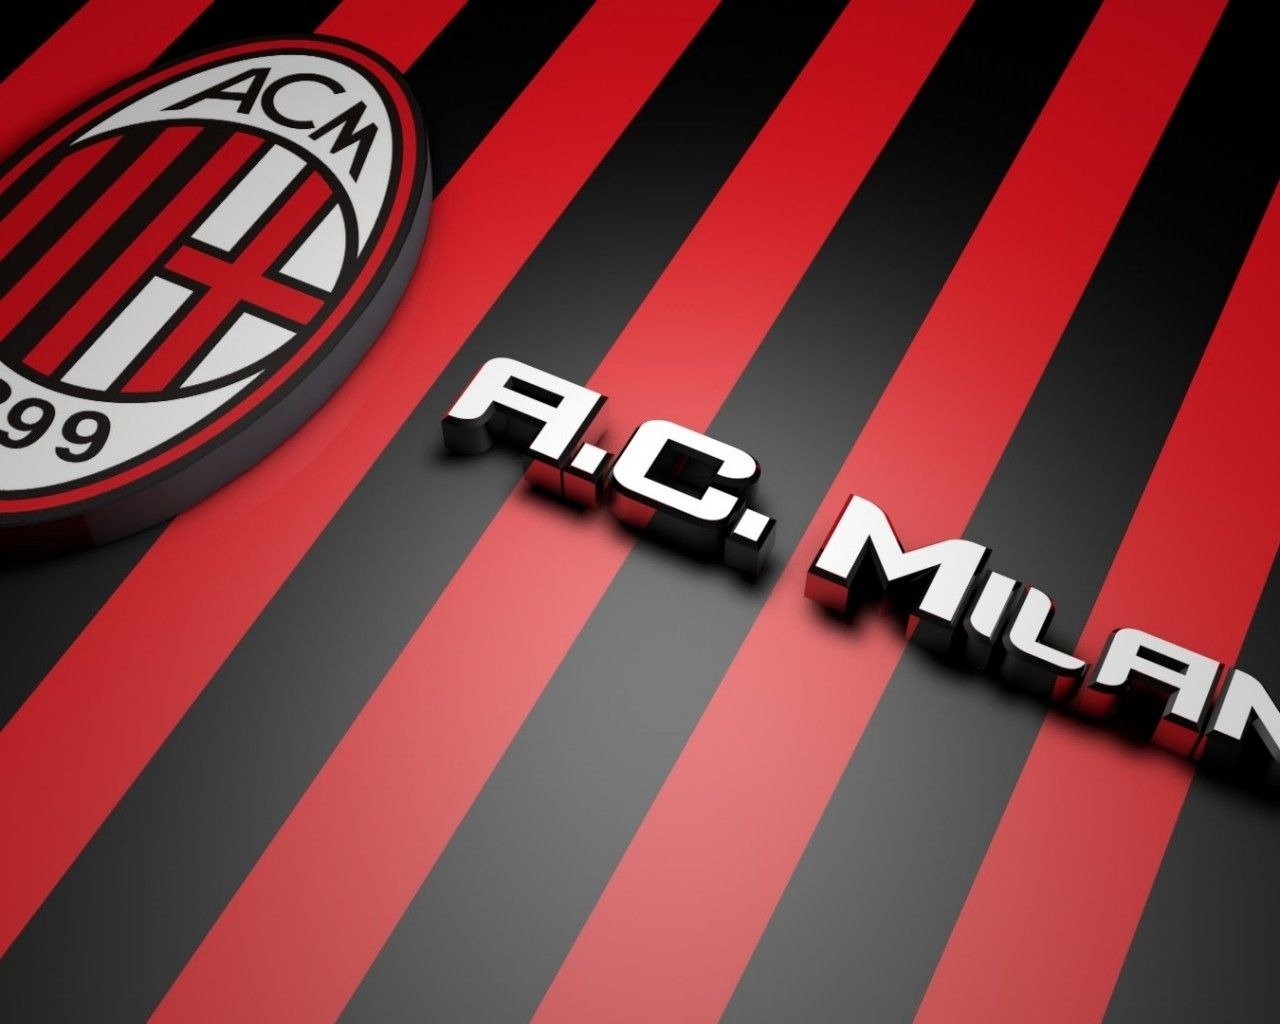 AC Milan 2014 3D Logo Wallpaper Wide or HD 3D Wallpapers 1280x1024